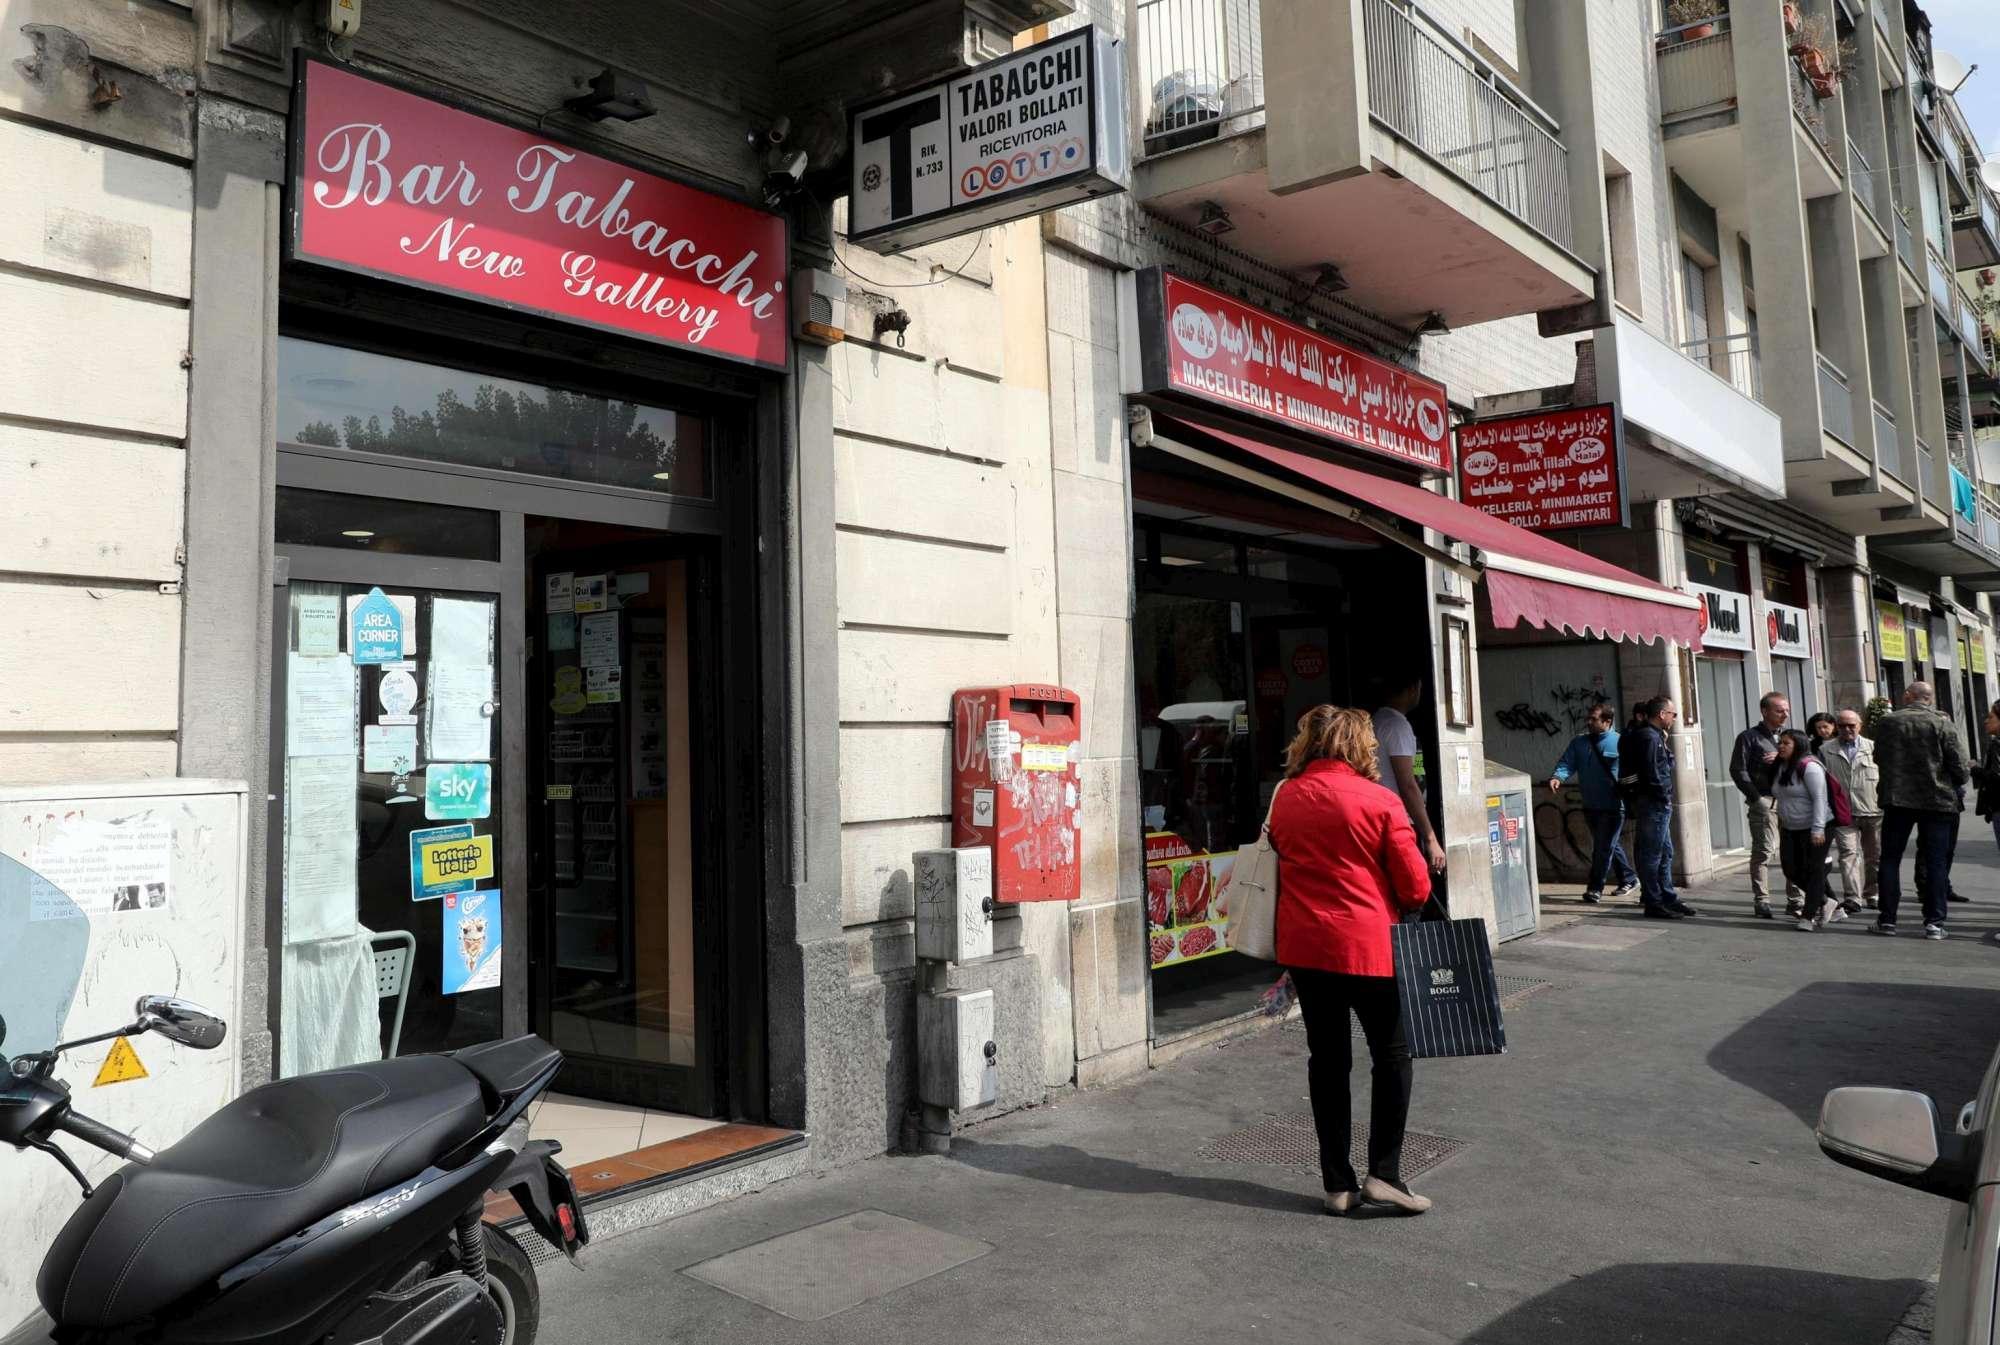 Notte di rapine a Milano, due vittime